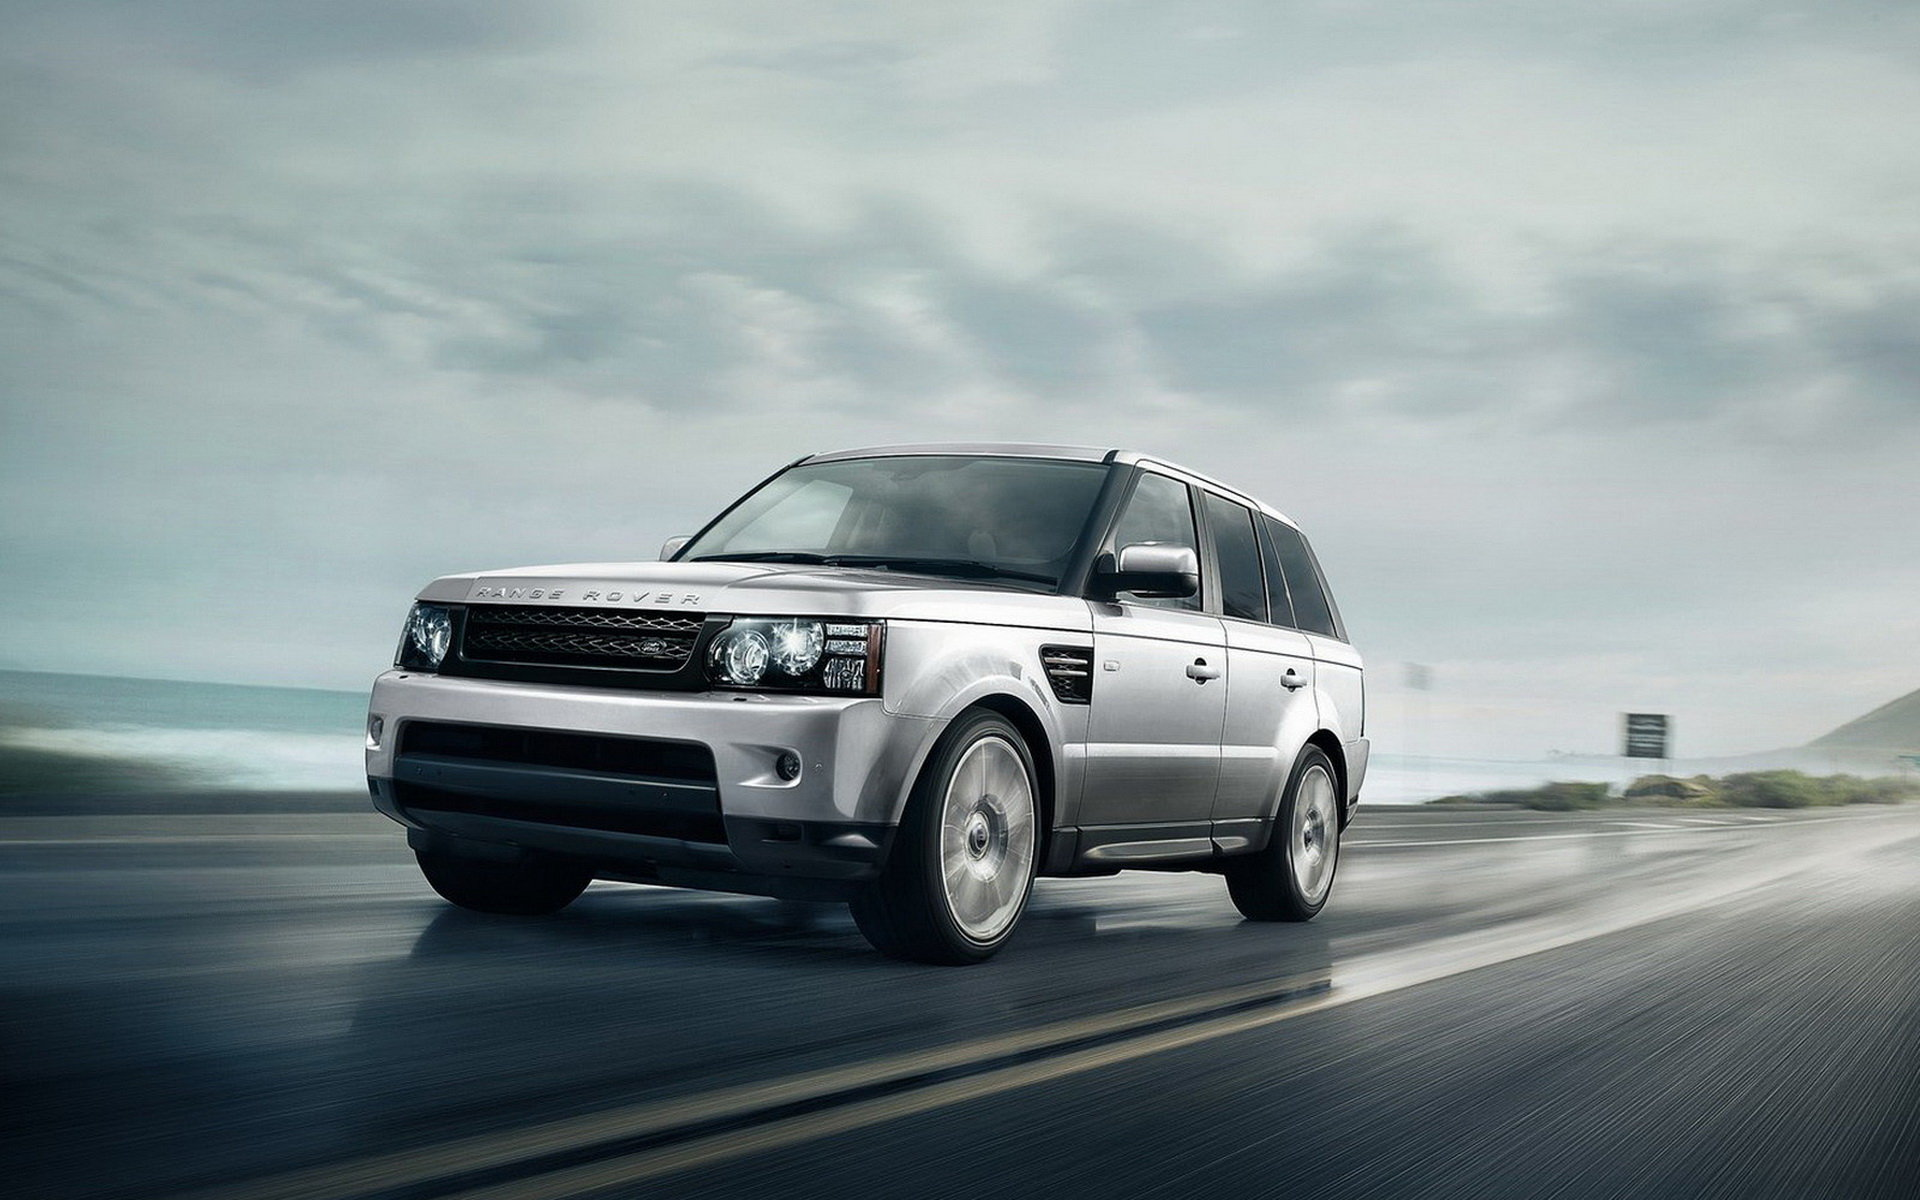 Range Rover Wallpapers Hd For Desktop Backgrounds